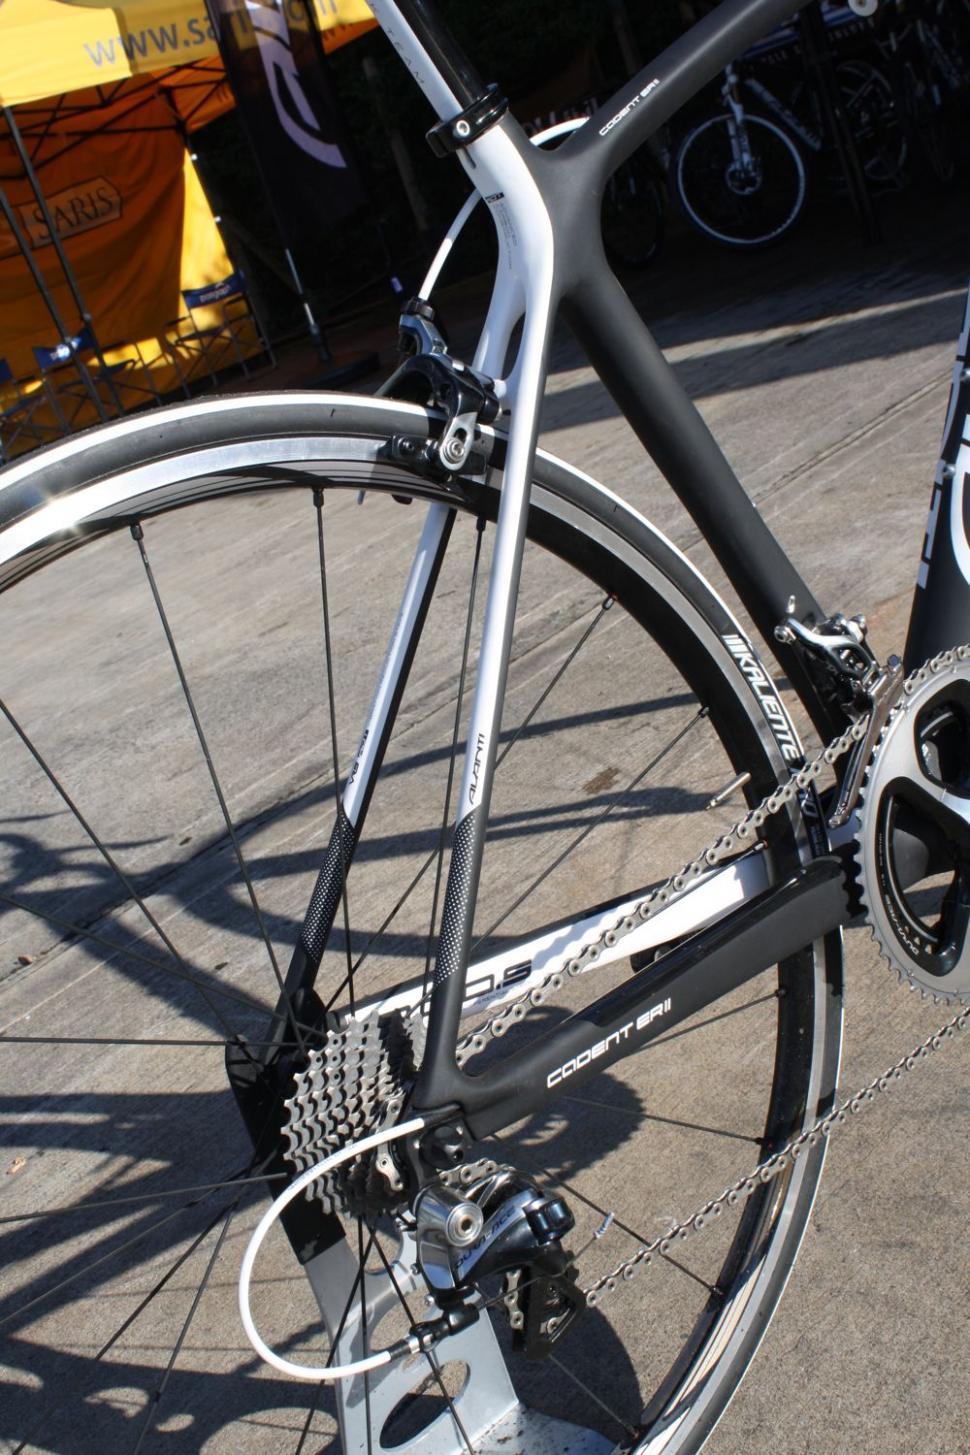 Avanti 2013 Carbon Road Bikes Practical Urban Bikes And